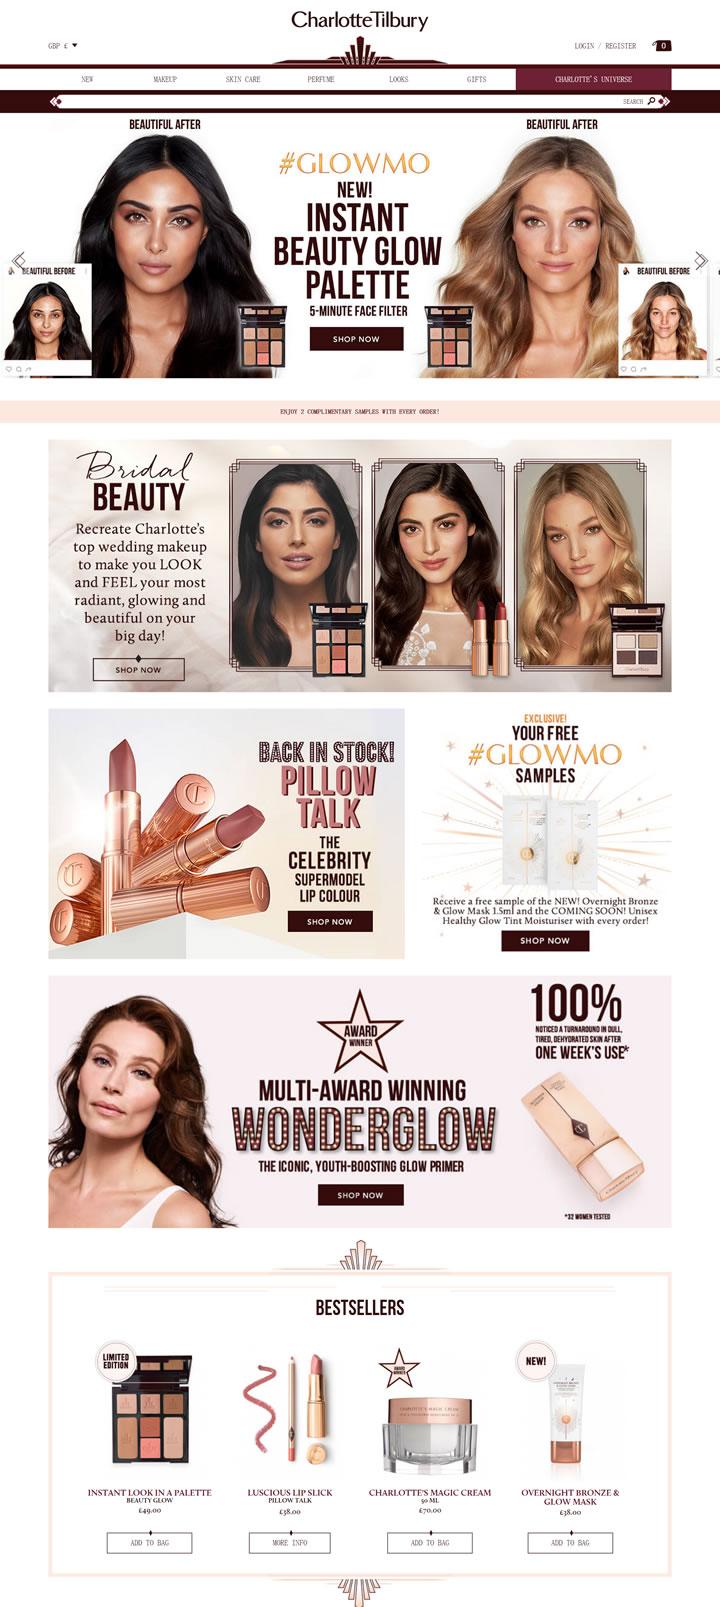 Charlotte Tilbury英国官网:英国彩妆品牌